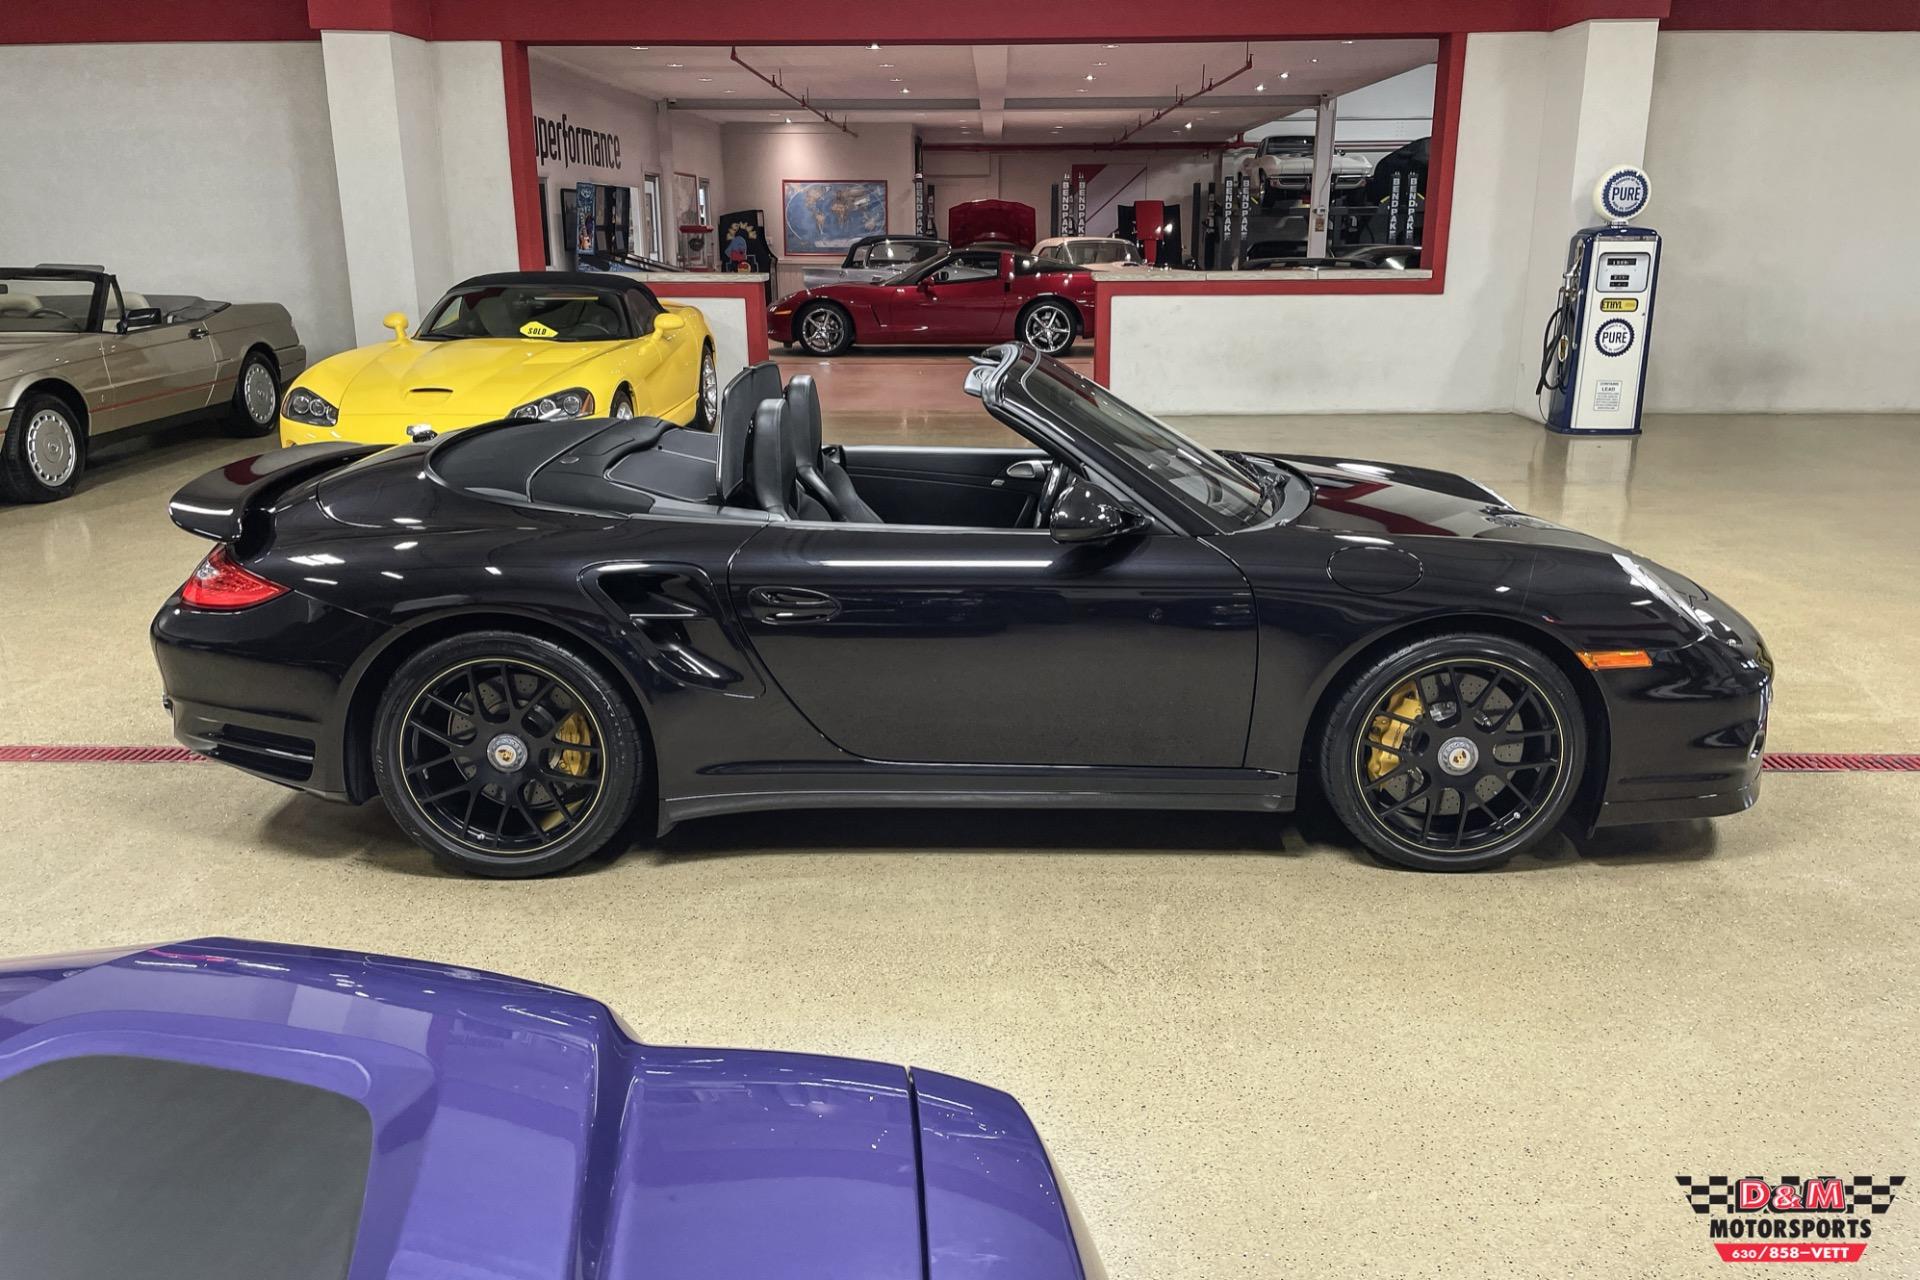 Used 2011 Porsche 911 Turbo S Cabriolet | Glen Ellyn, IL